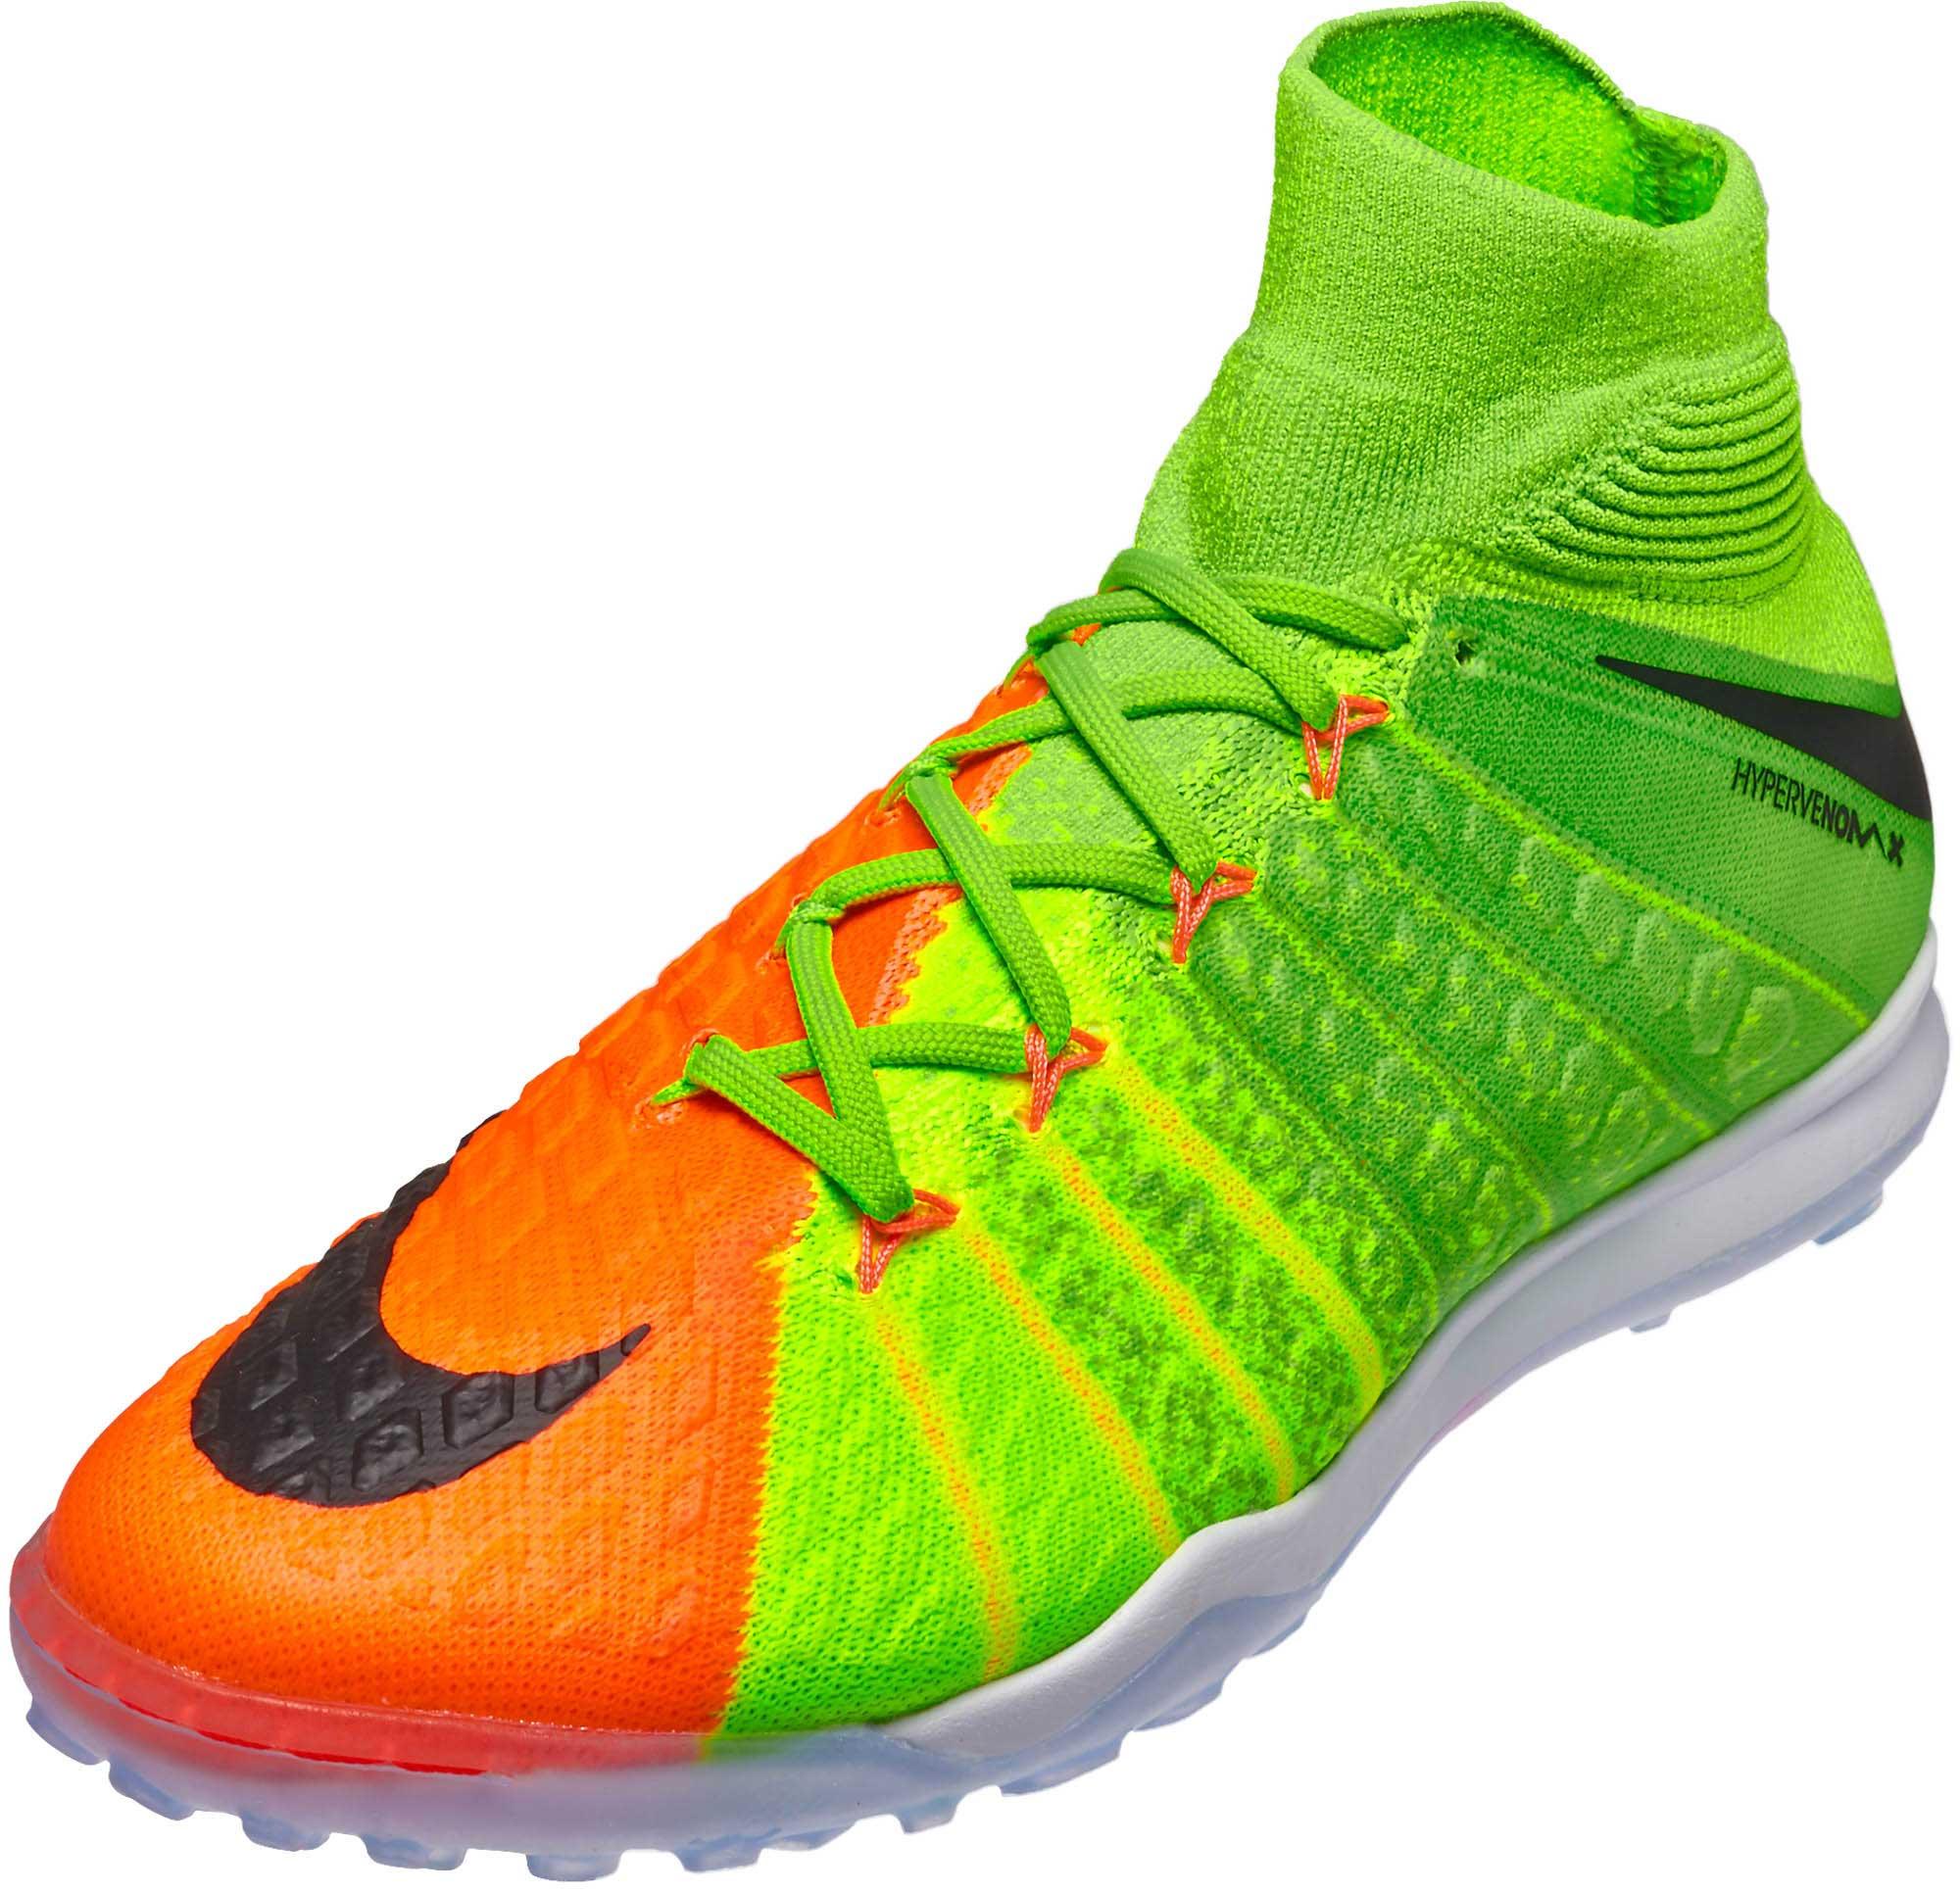 wholesale dealer b748f 7626b Nike HypervenomX Proximo II TF – Electric Green Hyper Orange